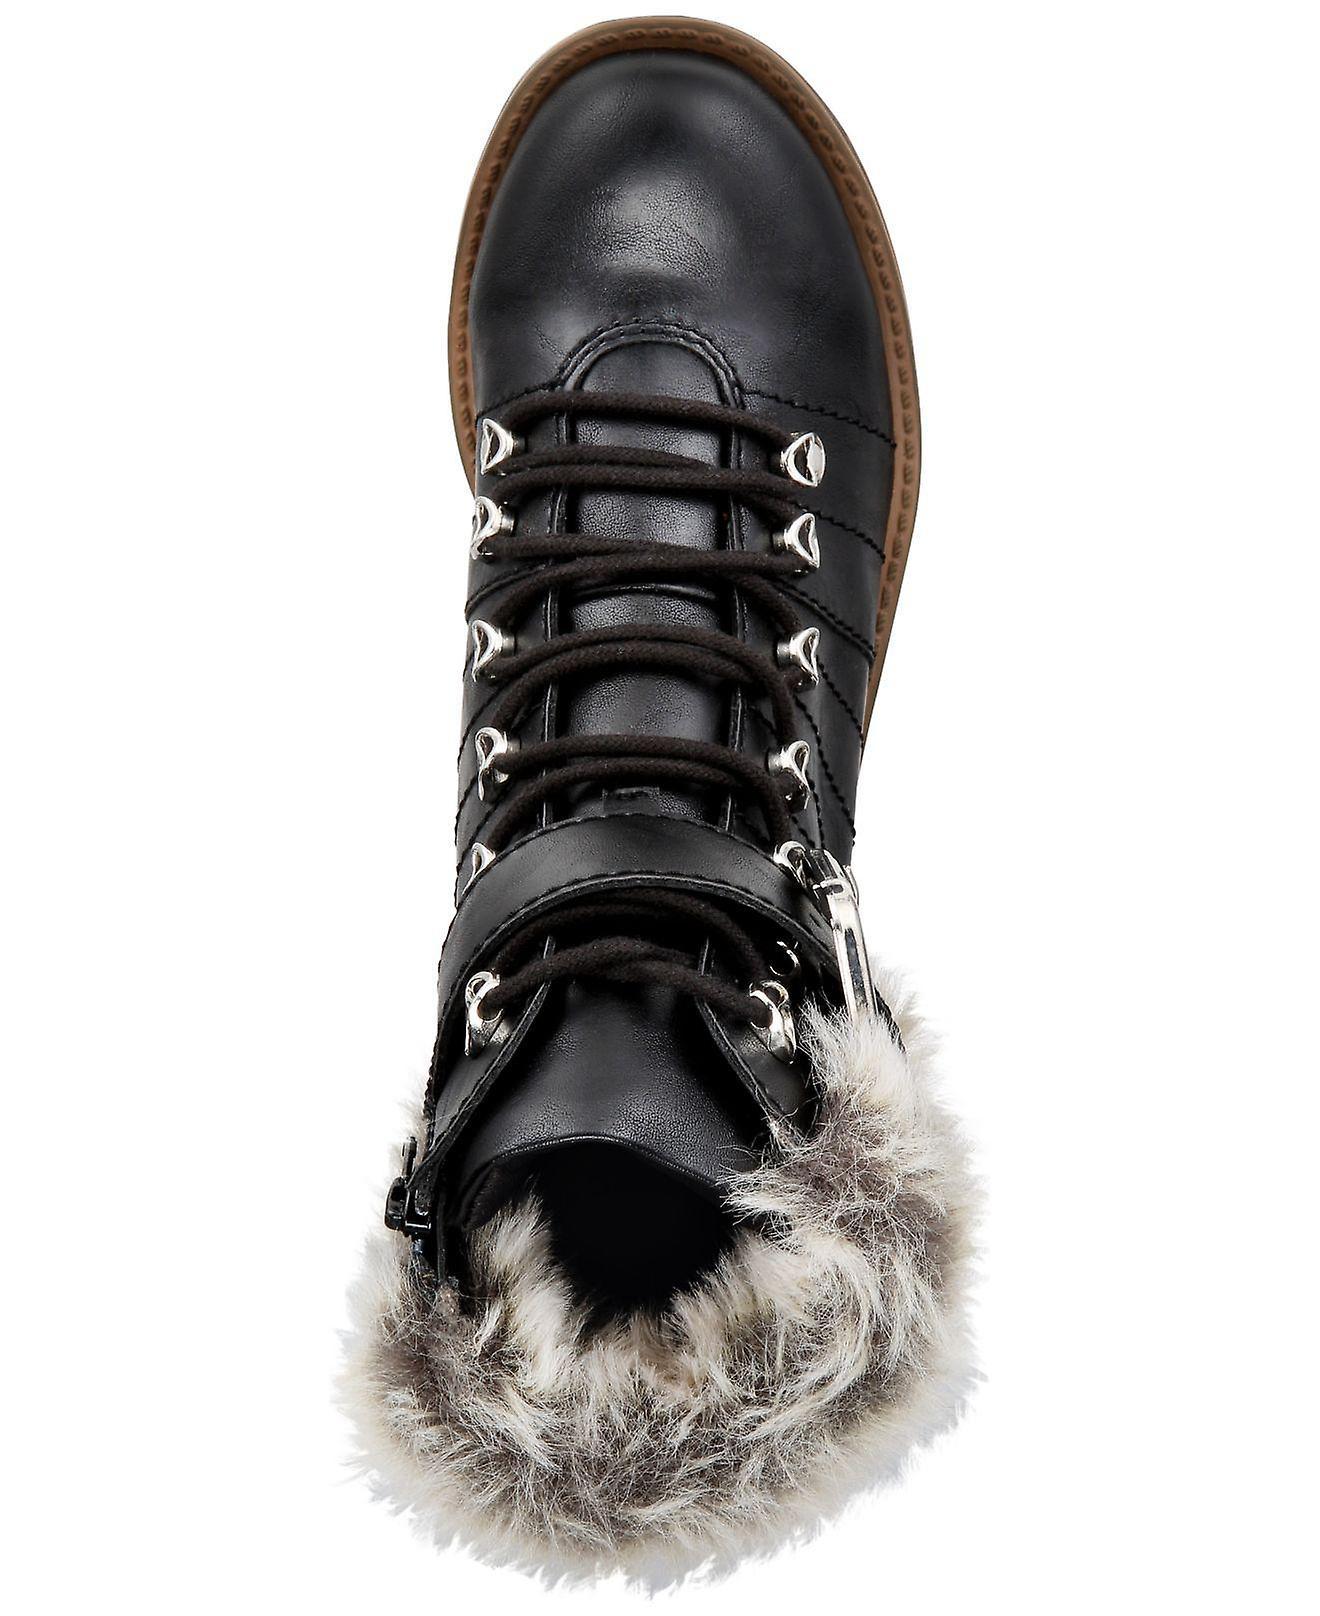 American Rag Womens JoJo Cuir Fermé Toe Ankle Motorcycle Boots - Remise particulière